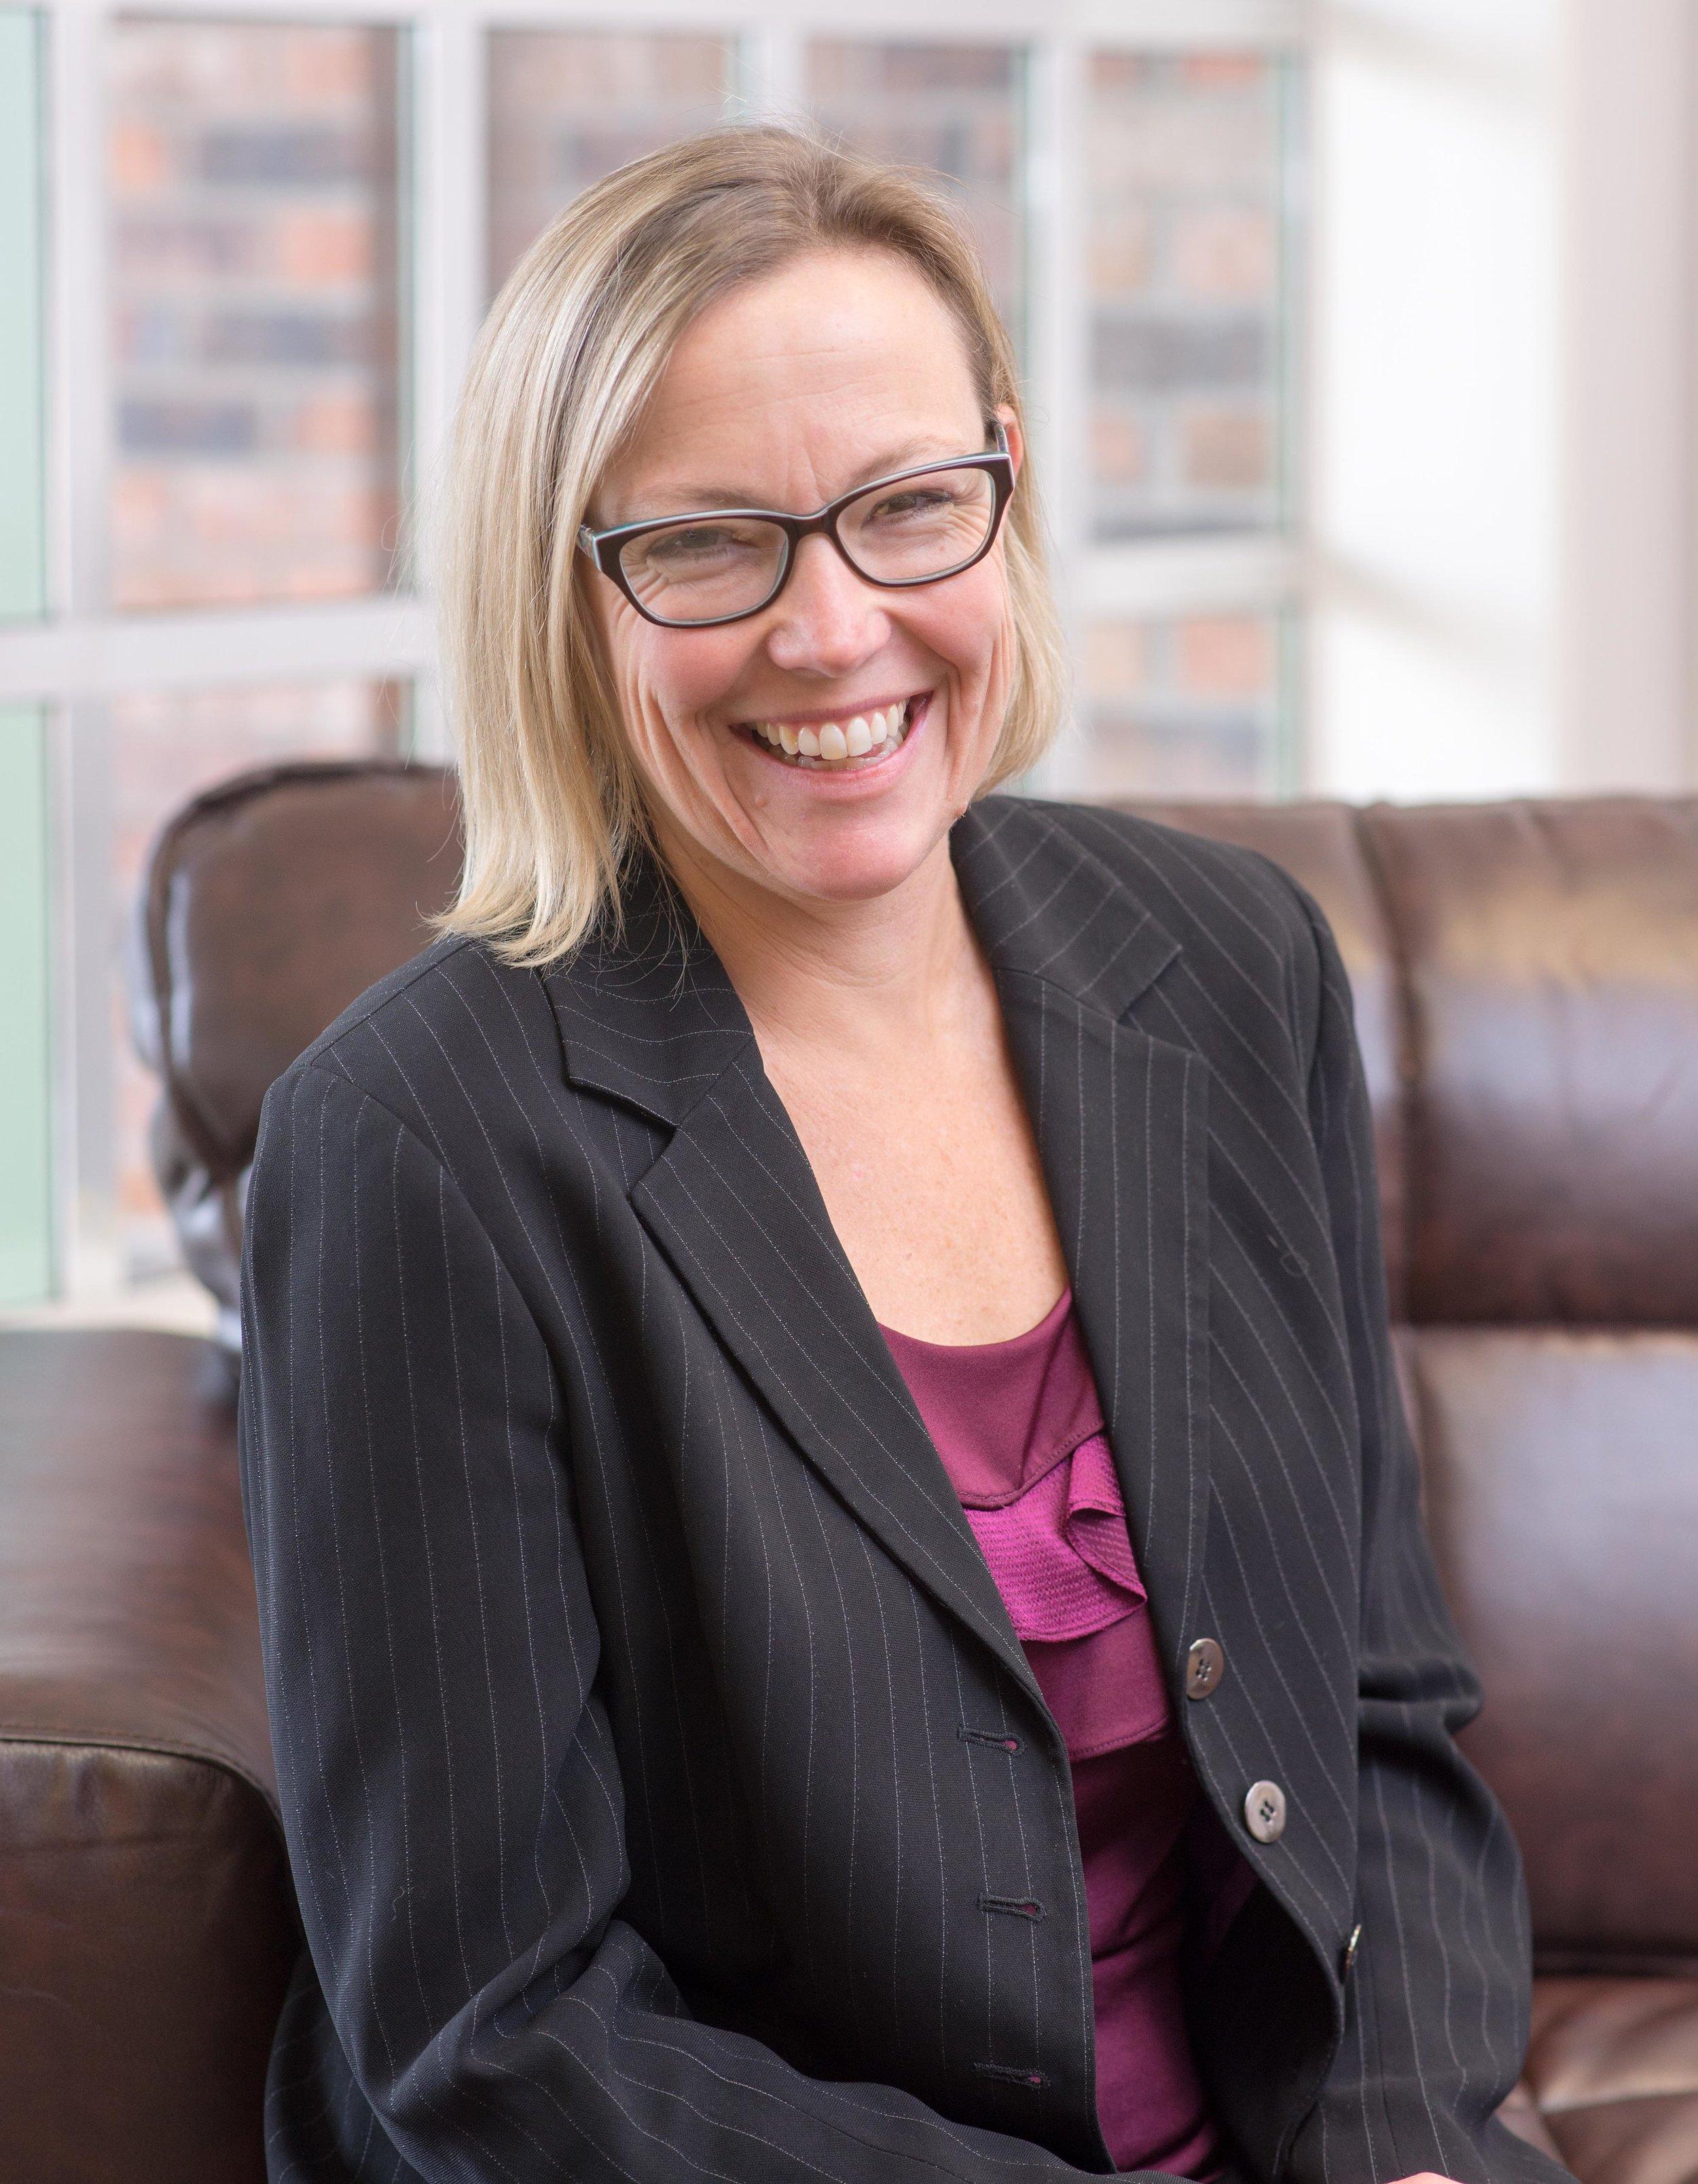 Dulcie Willis - TeacherActorChoreographerDirectorProducer